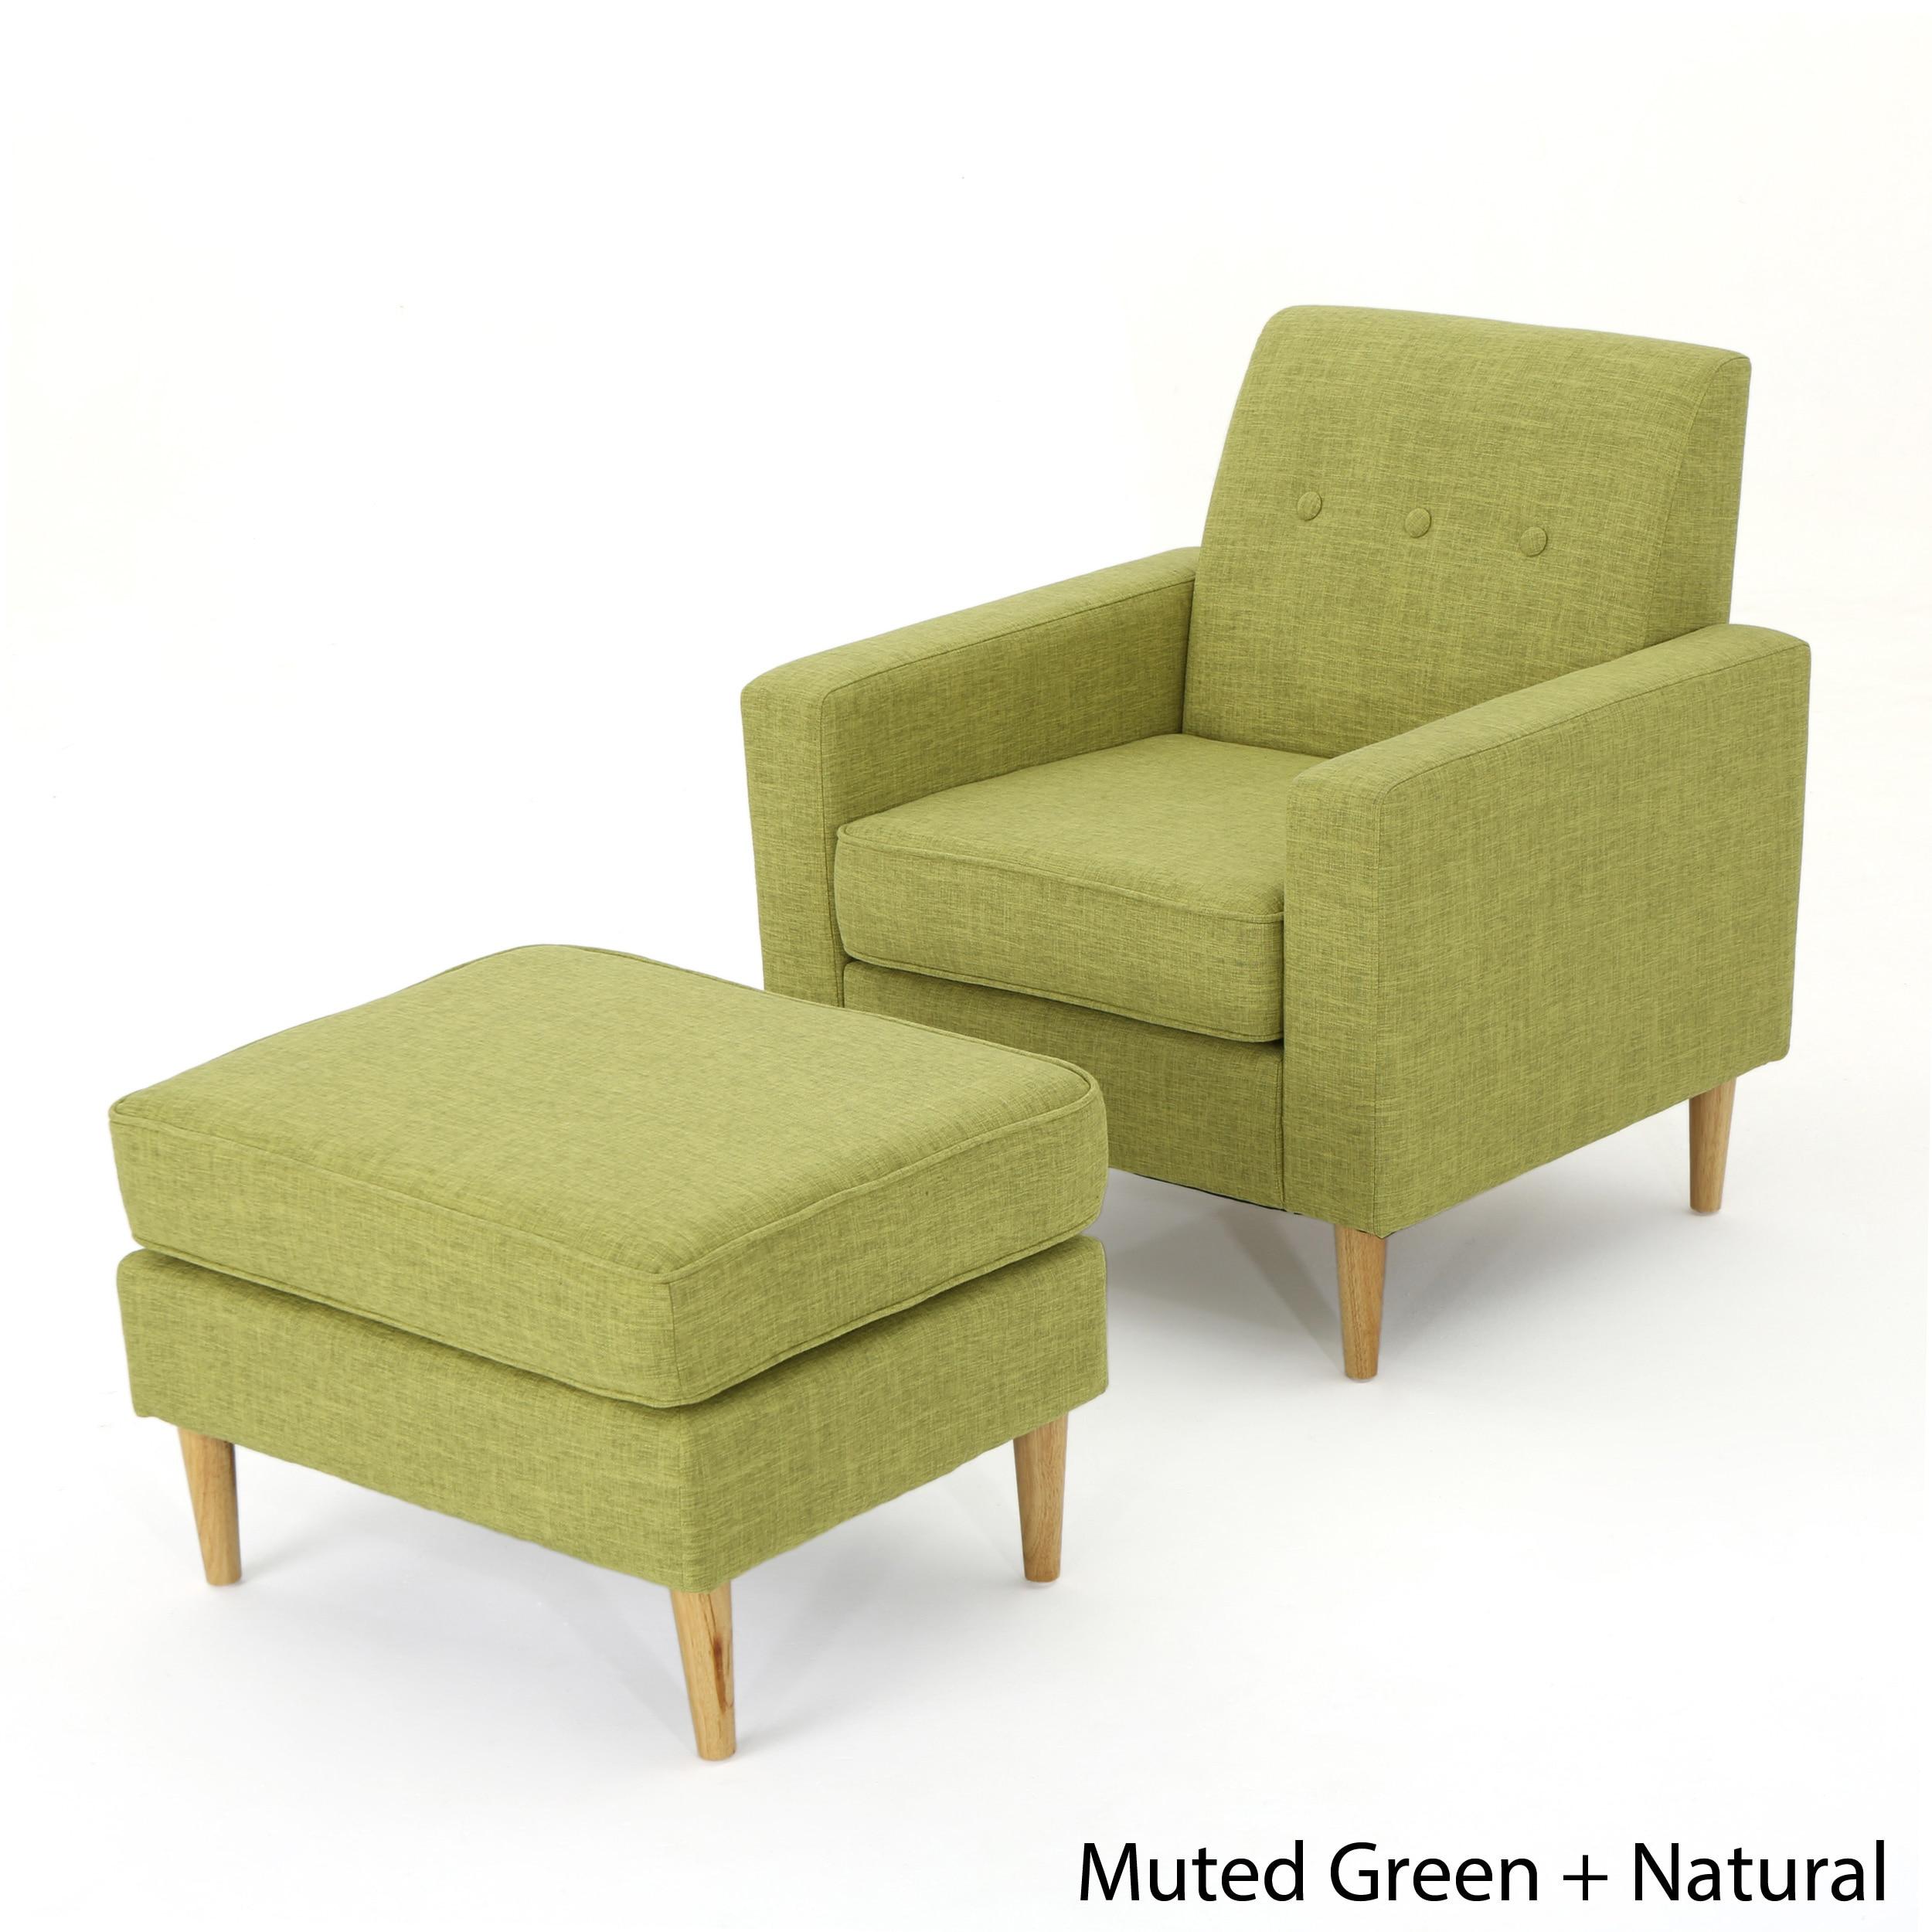 new york 61890 04a73 Sawyer Mid Century Modern Fabric Club Chair & Ottoman Set by Christopher  Knight Home